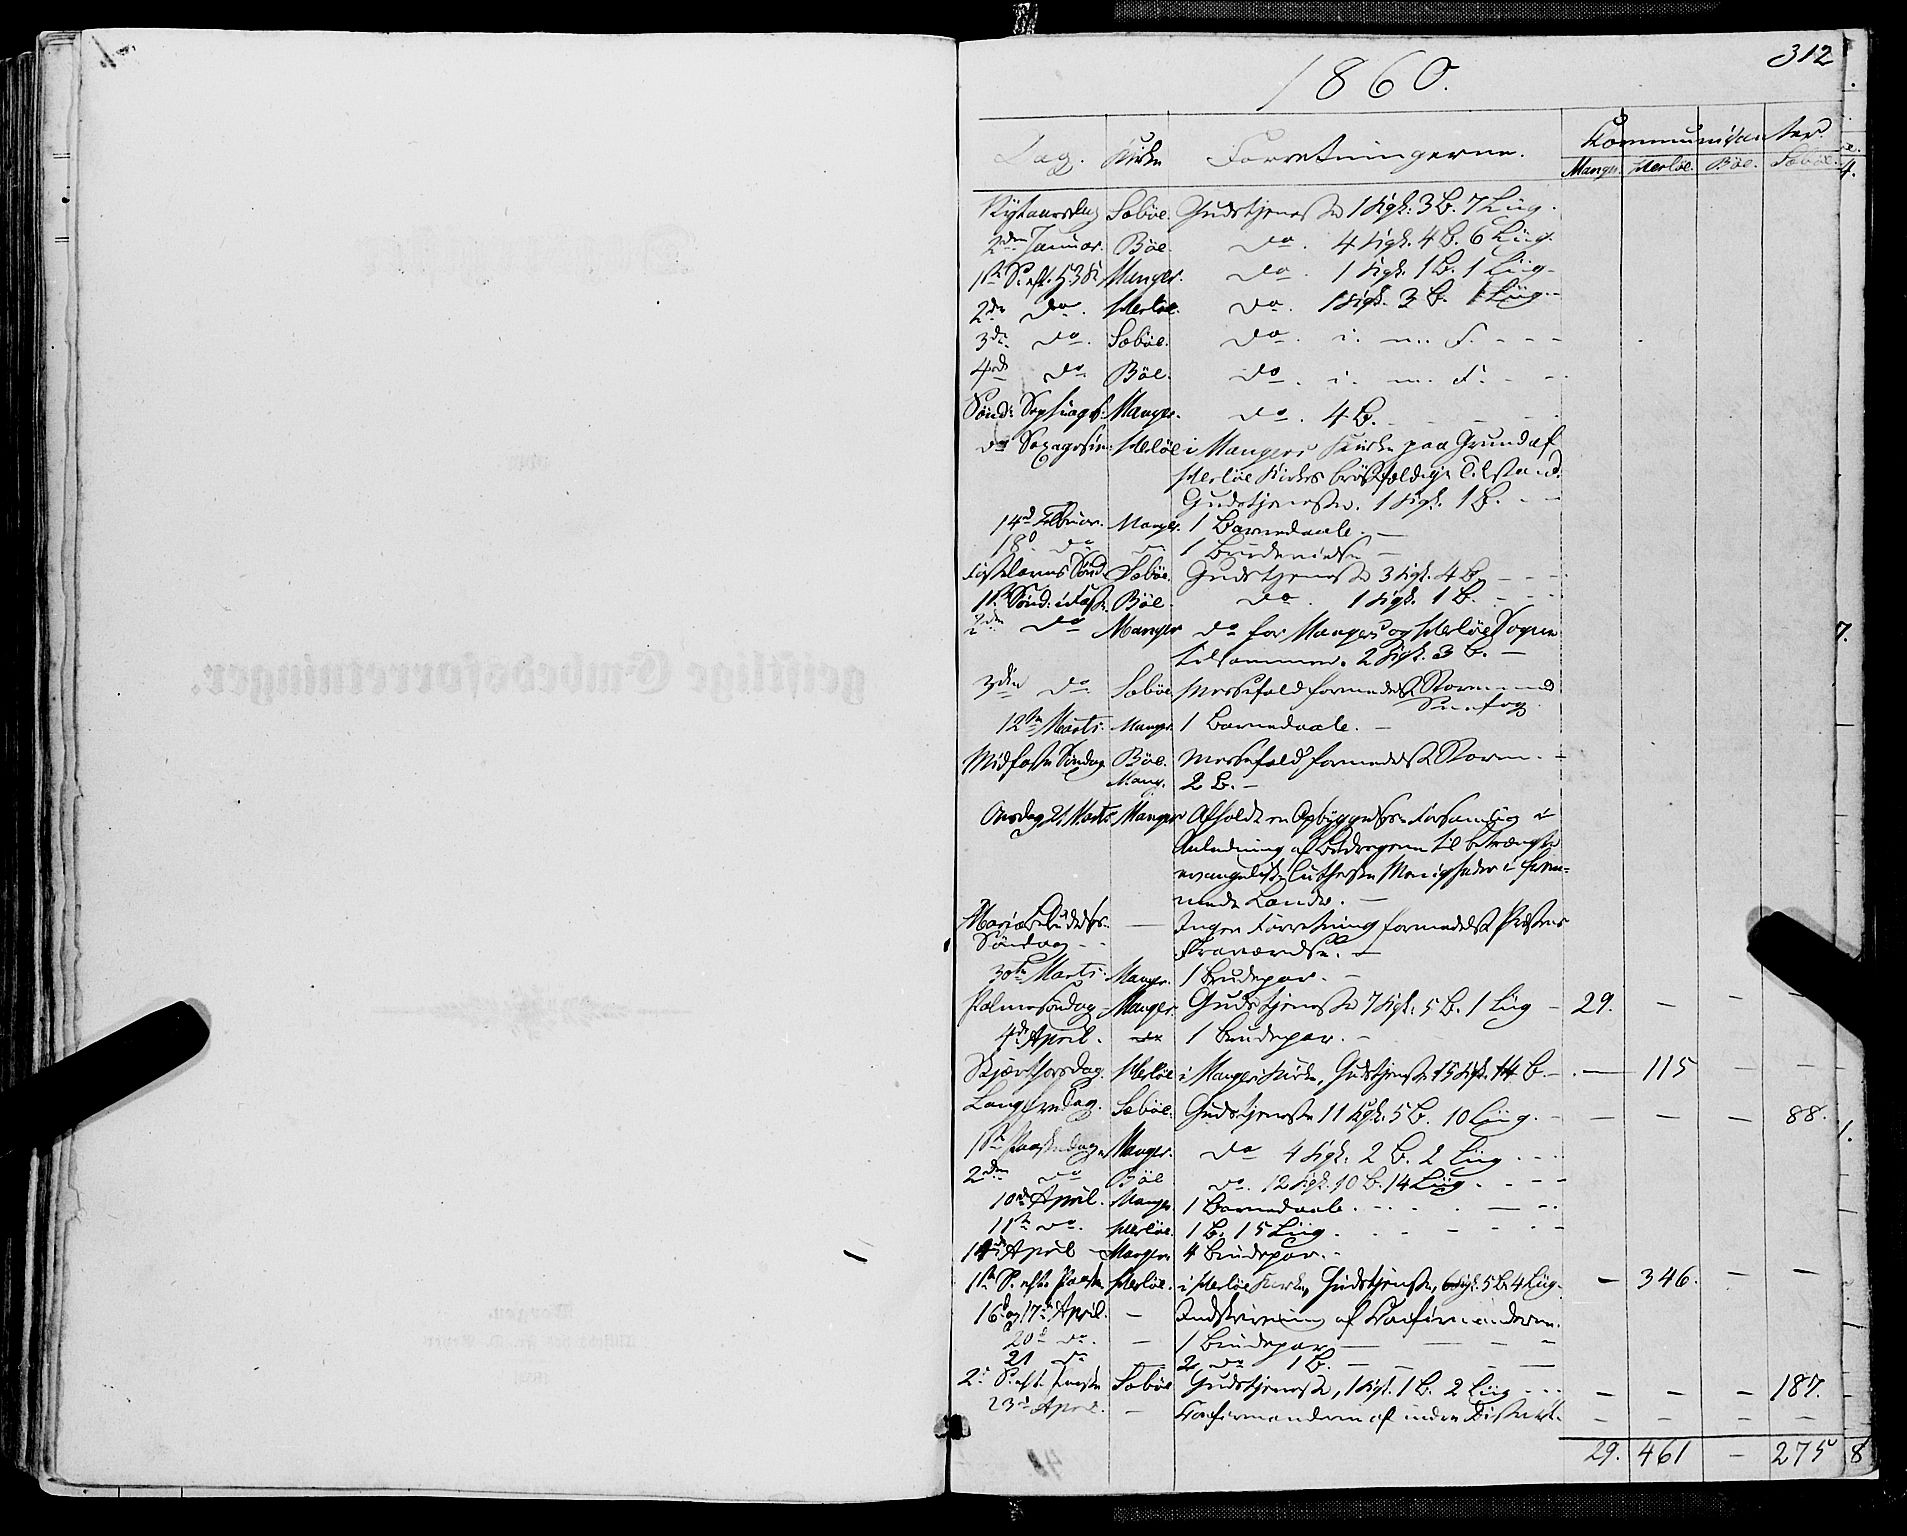 SAB, Manger sokneprestembete, H/Haa: Ministerialbok nr. A 7, 1860-1870, s. 312